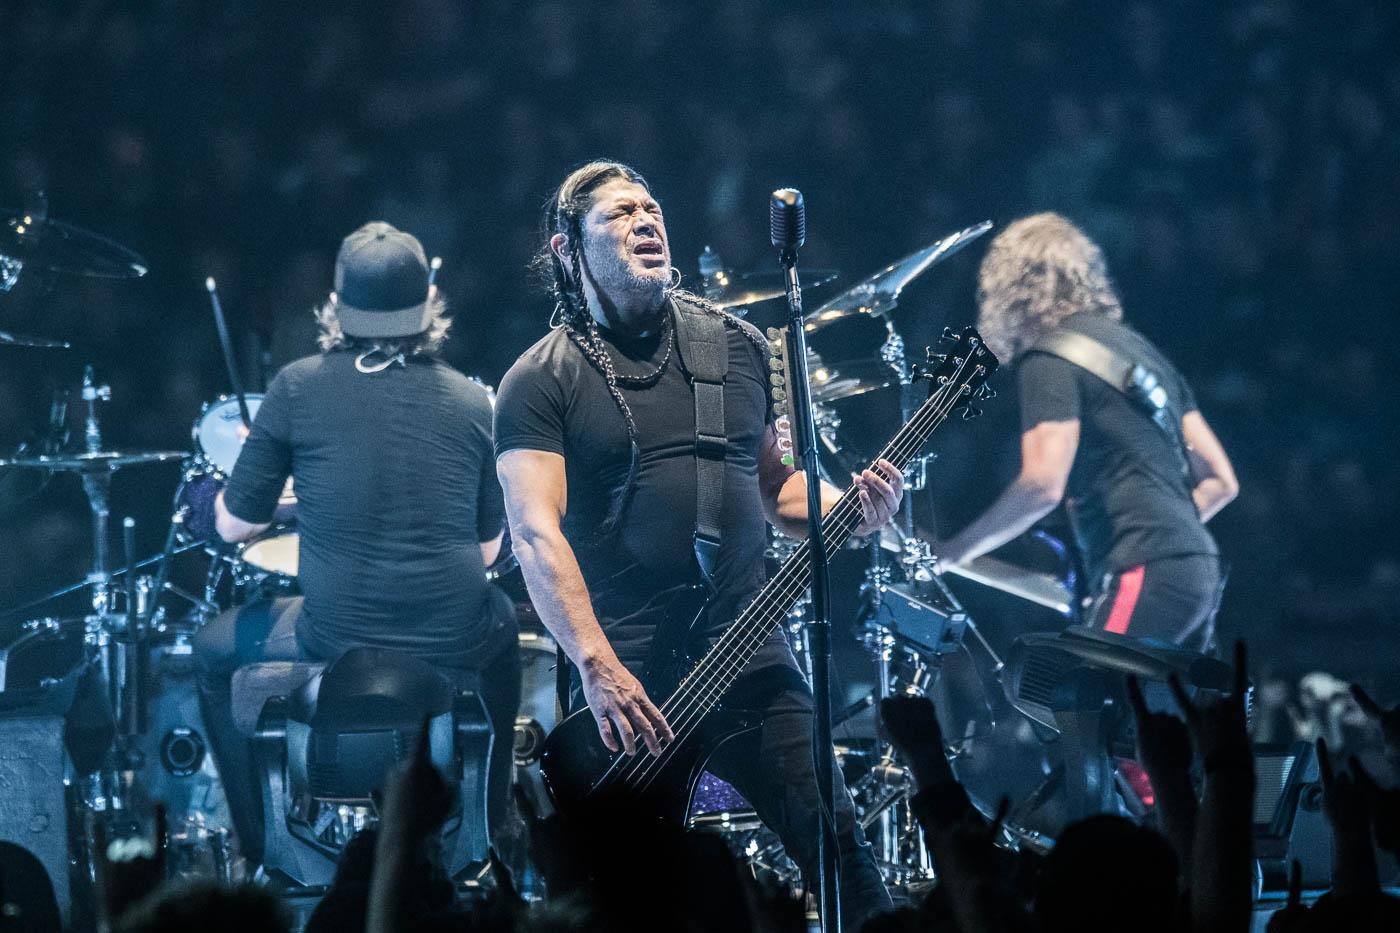 20180502-Metallica@Telenor_Arena_Willy_Larsen_DH (37 of 46)